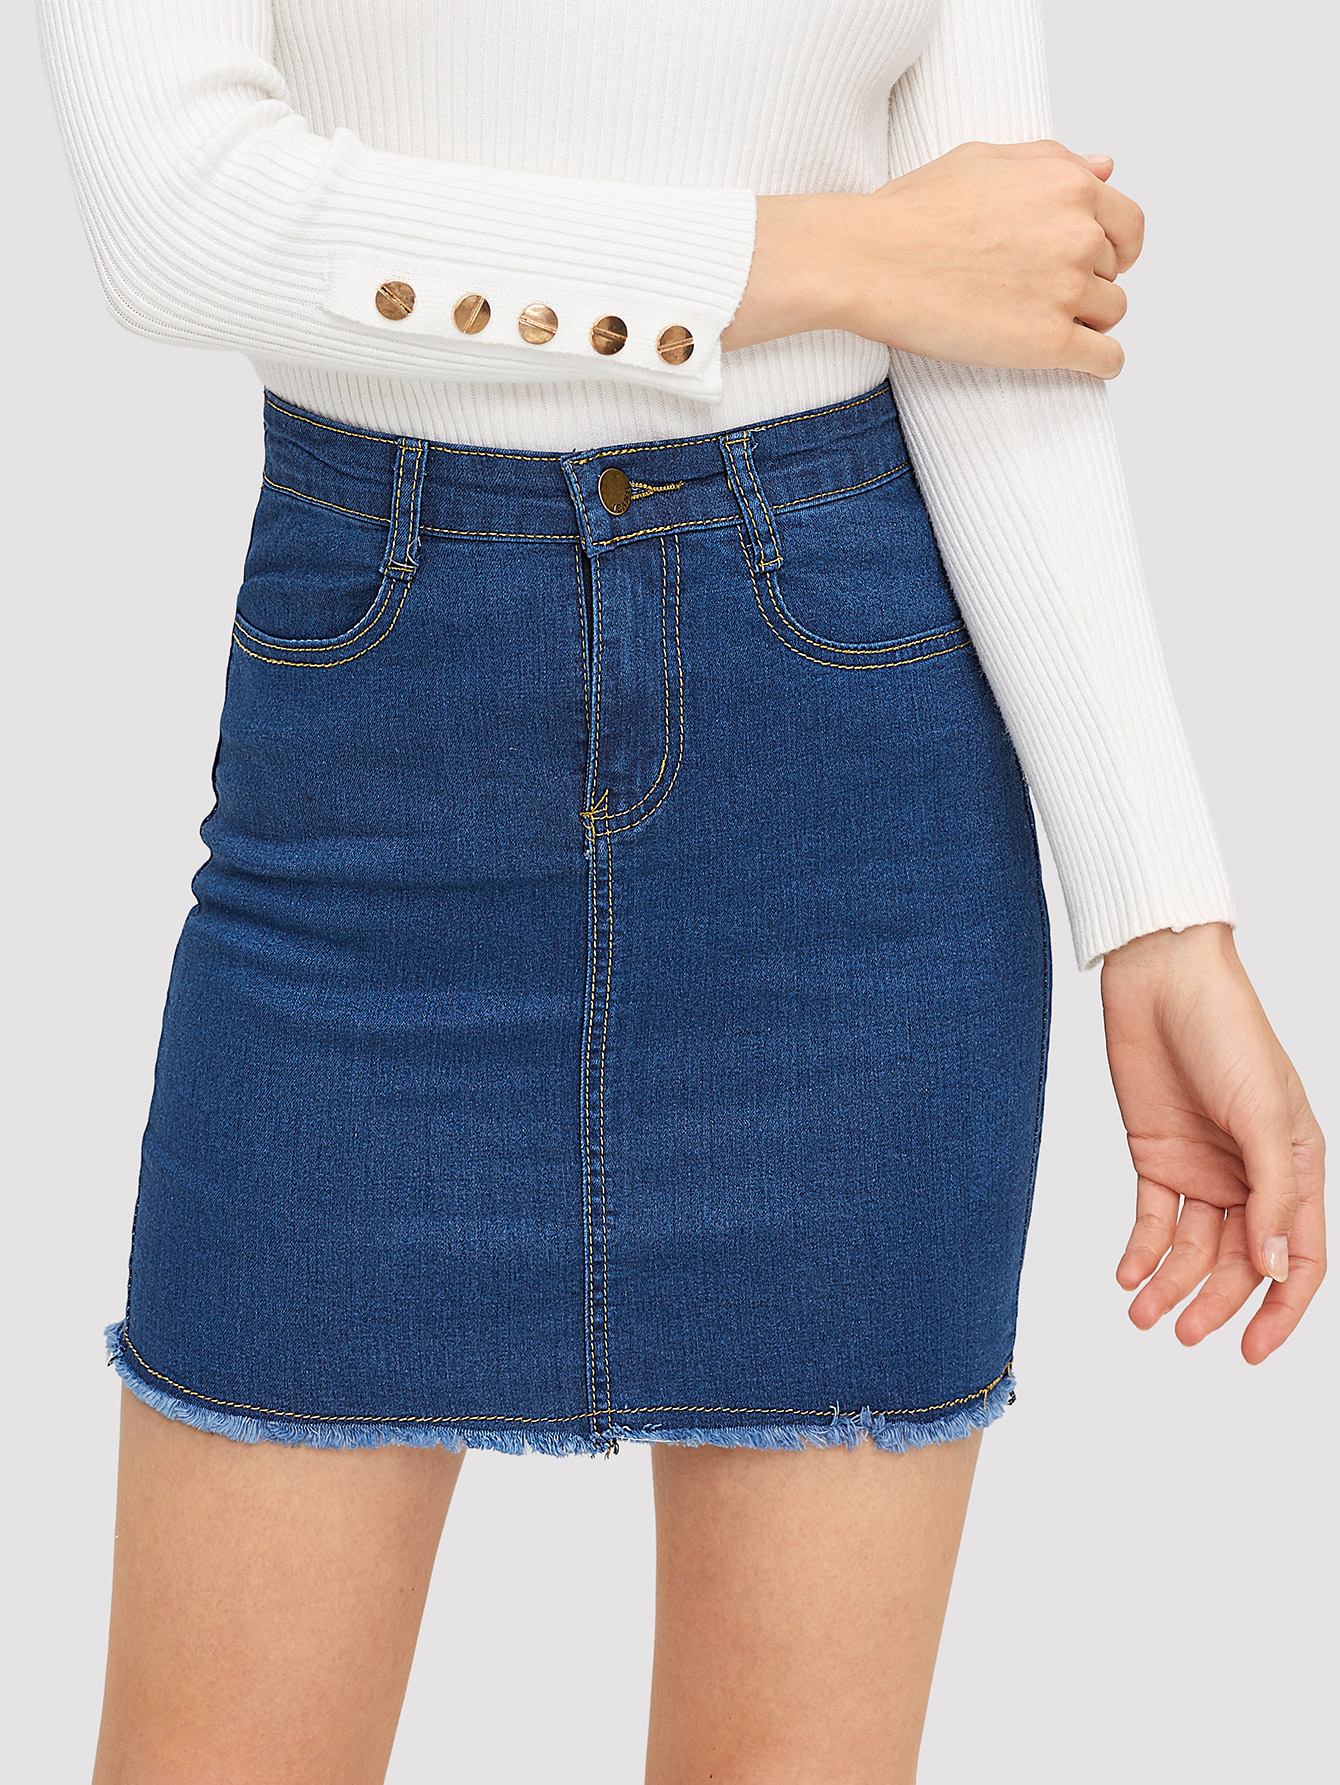 Raw Hem Stitch Detail Denim Skirt Raw Hem Stitch Detail Denim Skirt